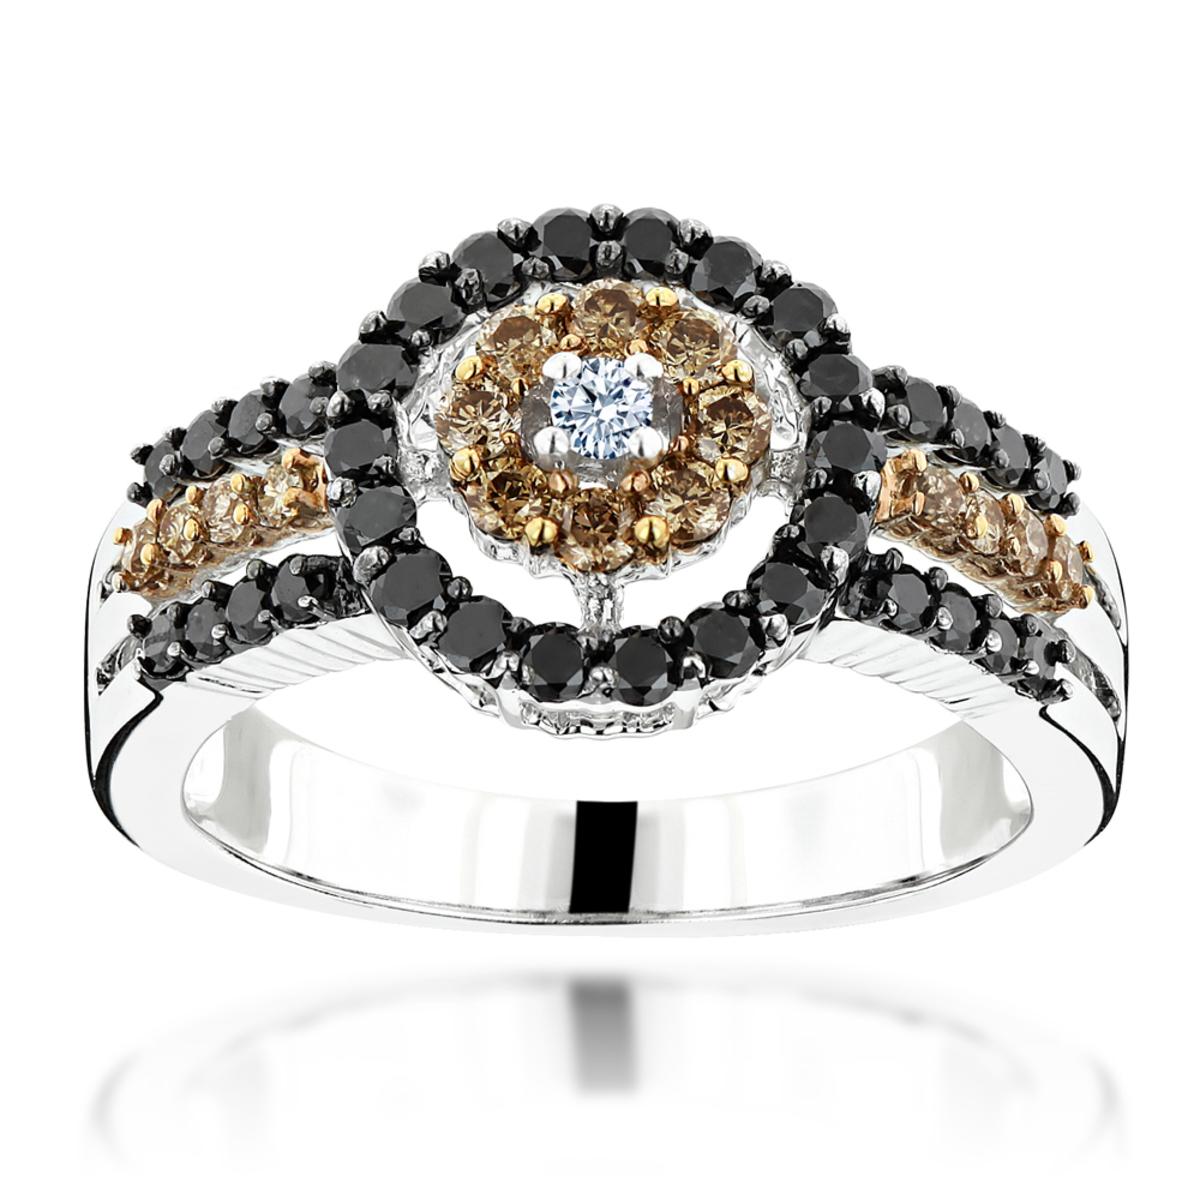 White Brown Black Diamond Ring 0.94ct 14K Gold Womens Jewelry